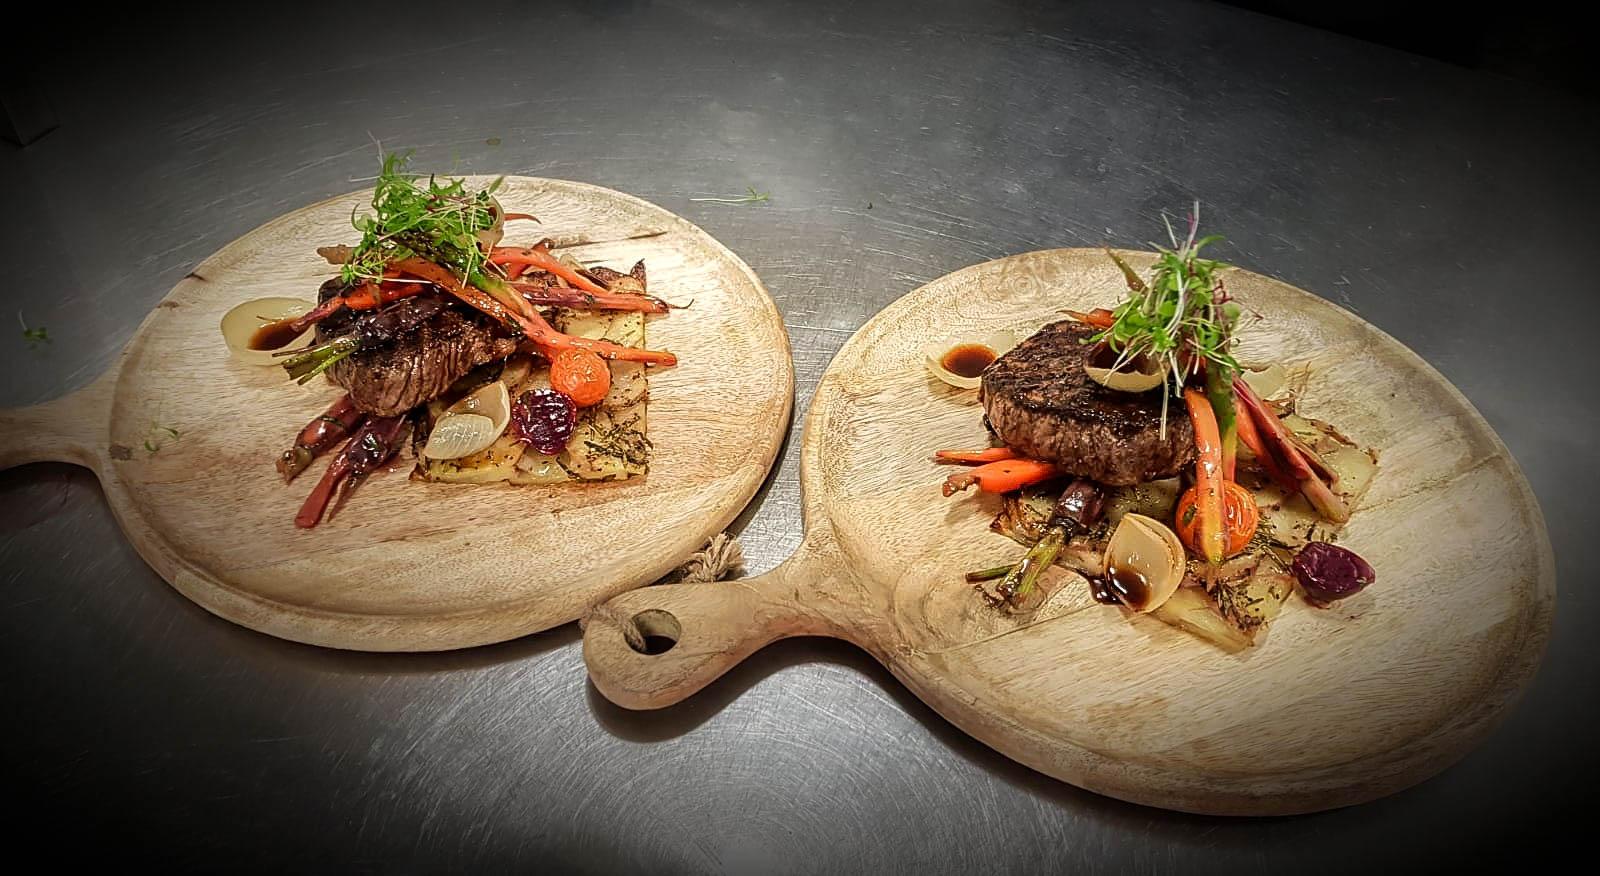 http://www.thalabeach.com.au/wp-content/uploads/2019/02/Thala-main-course-beef.jpg